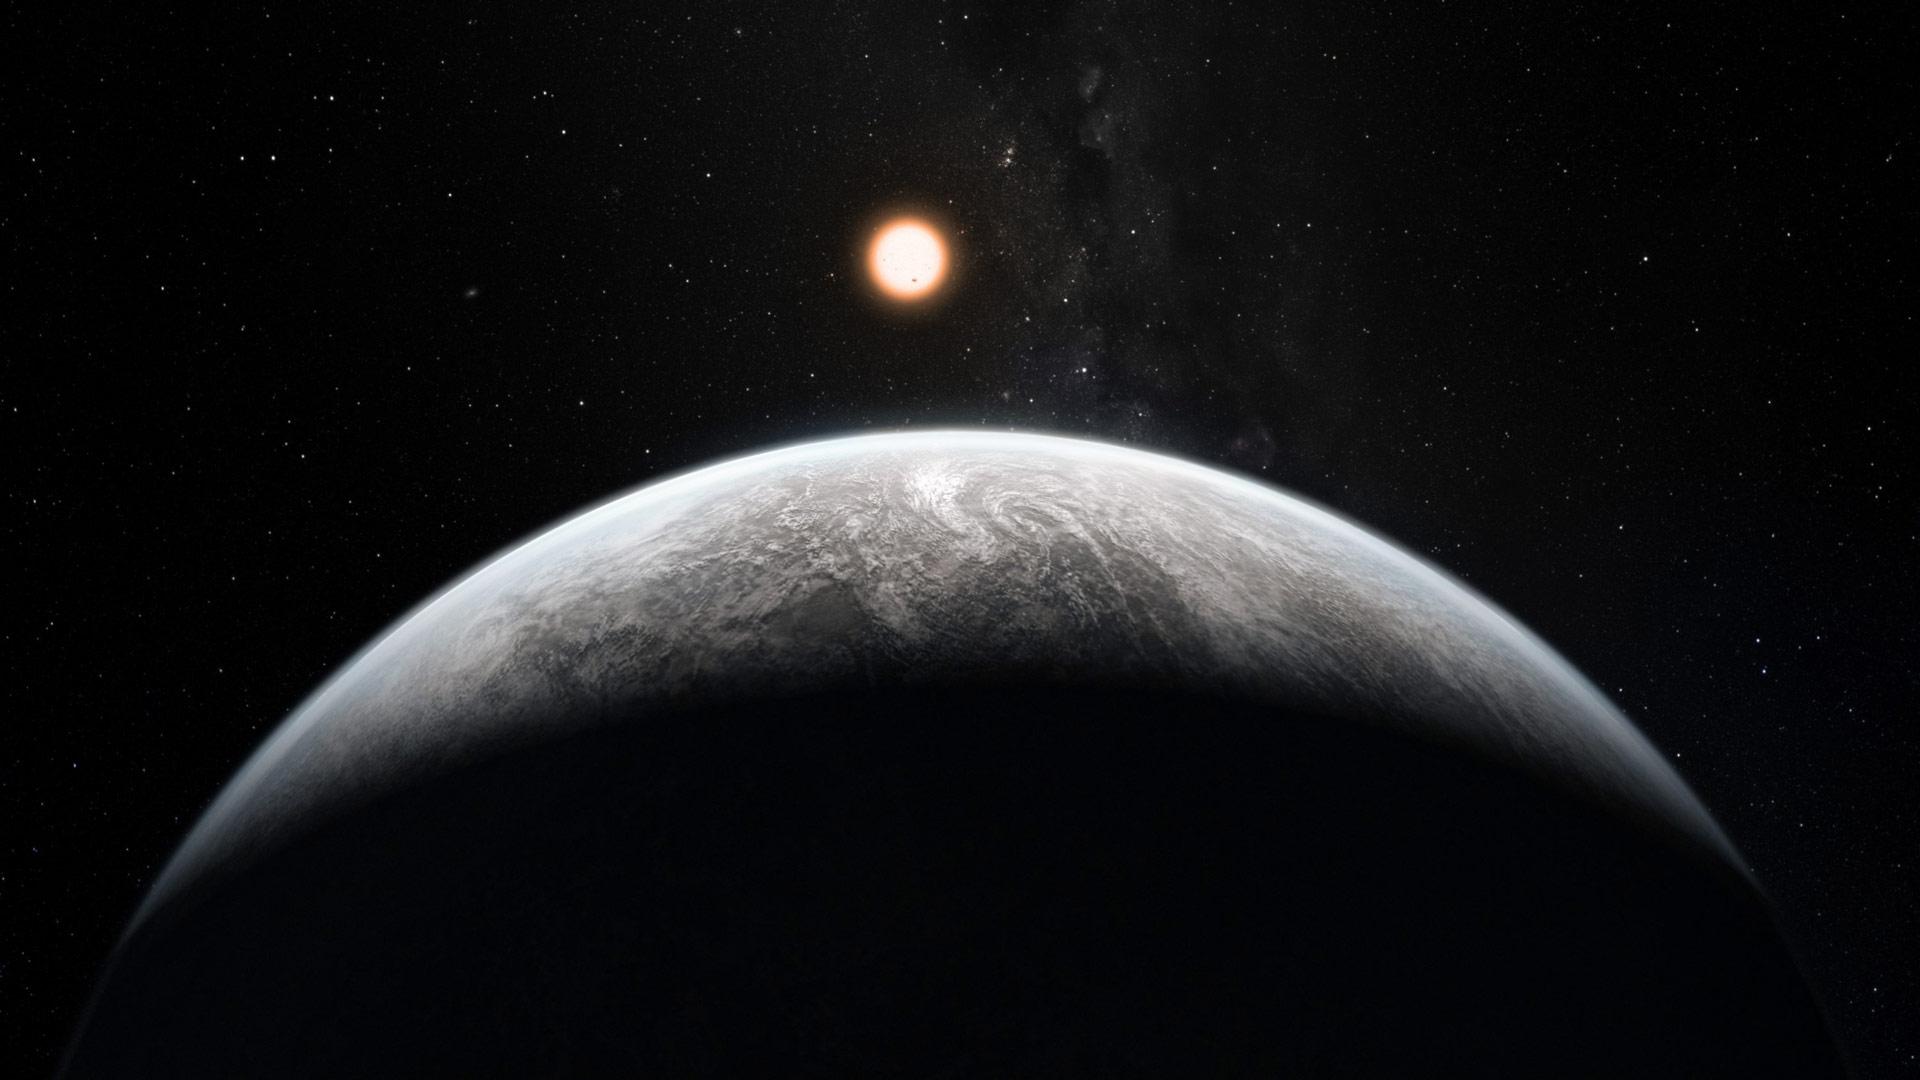 Artist's impression of a Super-Earth planet orbiting a Sun-like star. - Image Credit: ESO/M. Kornmesser